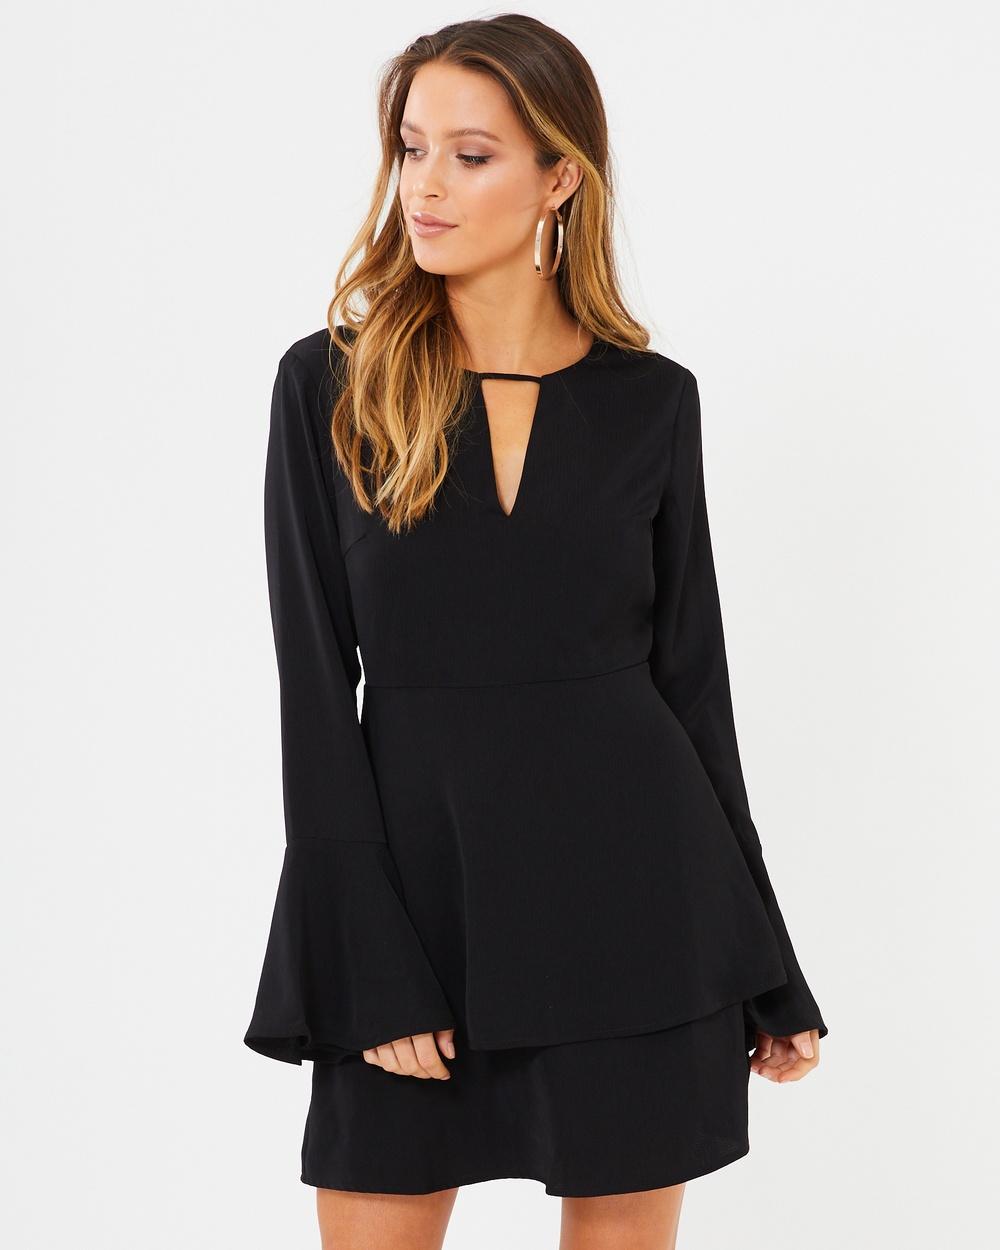 Calli Vienna Double layered Dress Dresses Black Vienna Double layered Dress